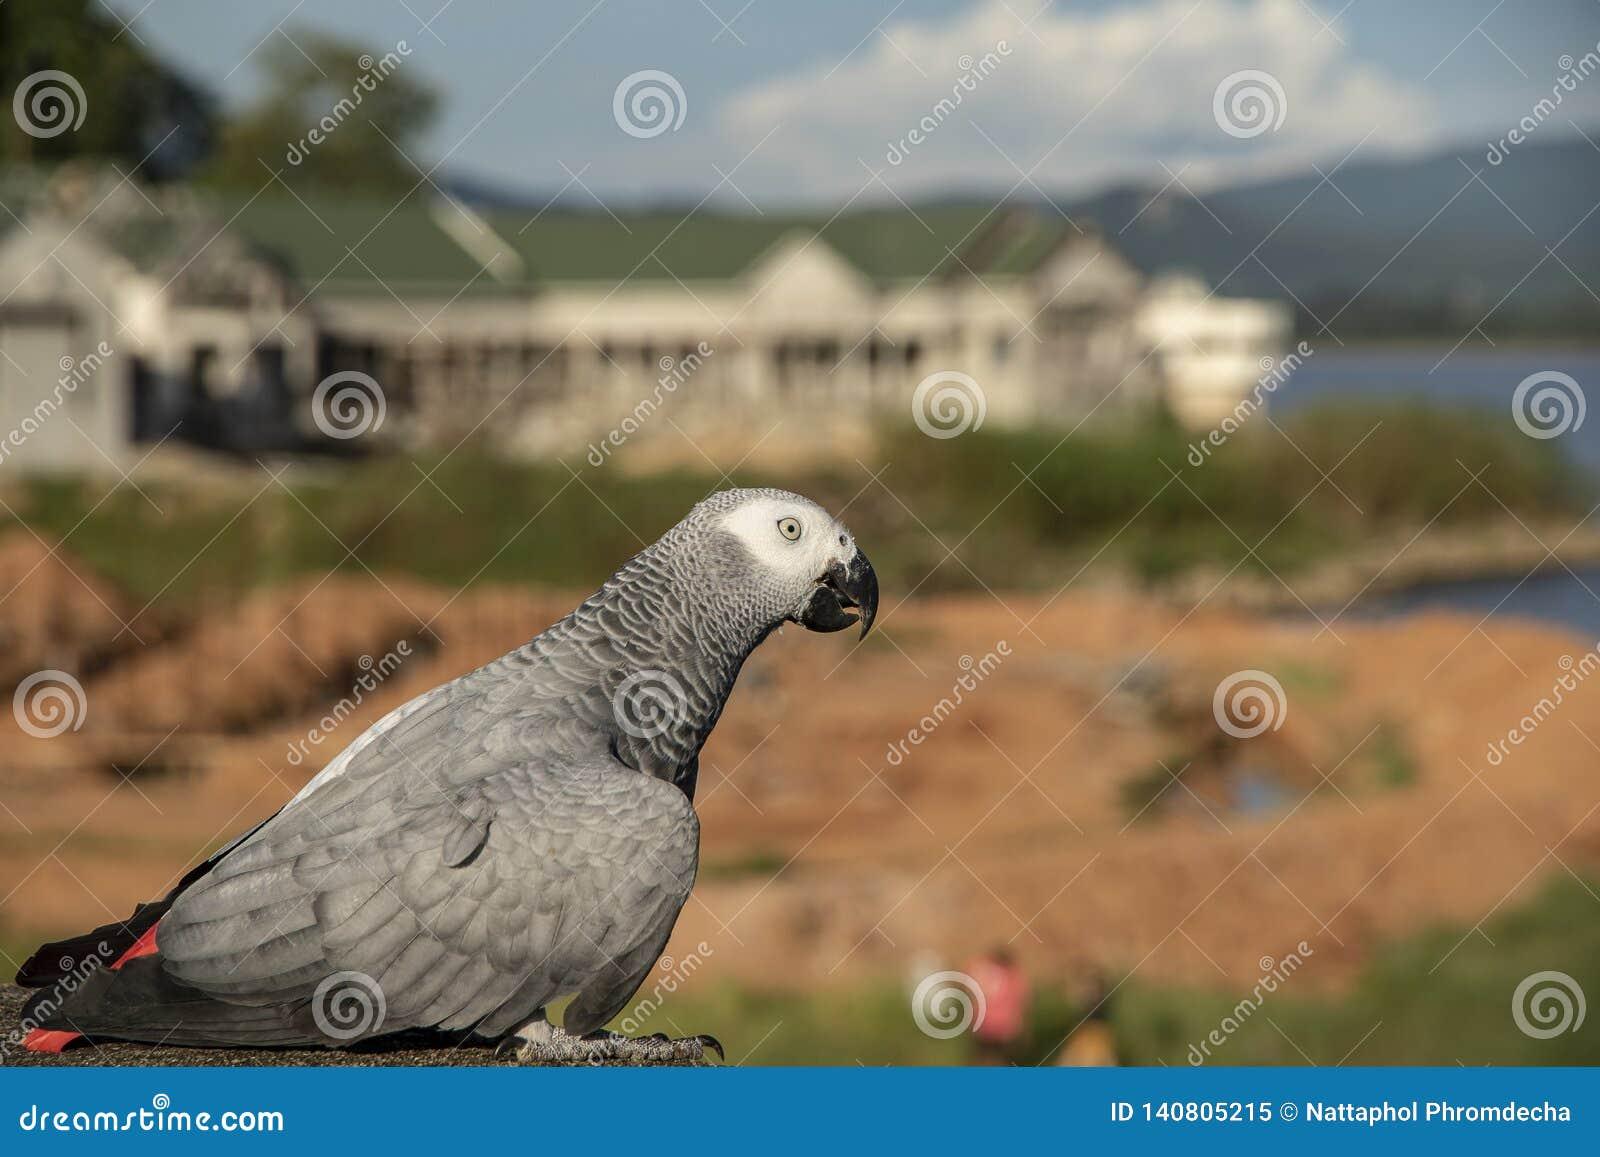 Loro ascendente cercano del pájaro del macore en fondo borroso